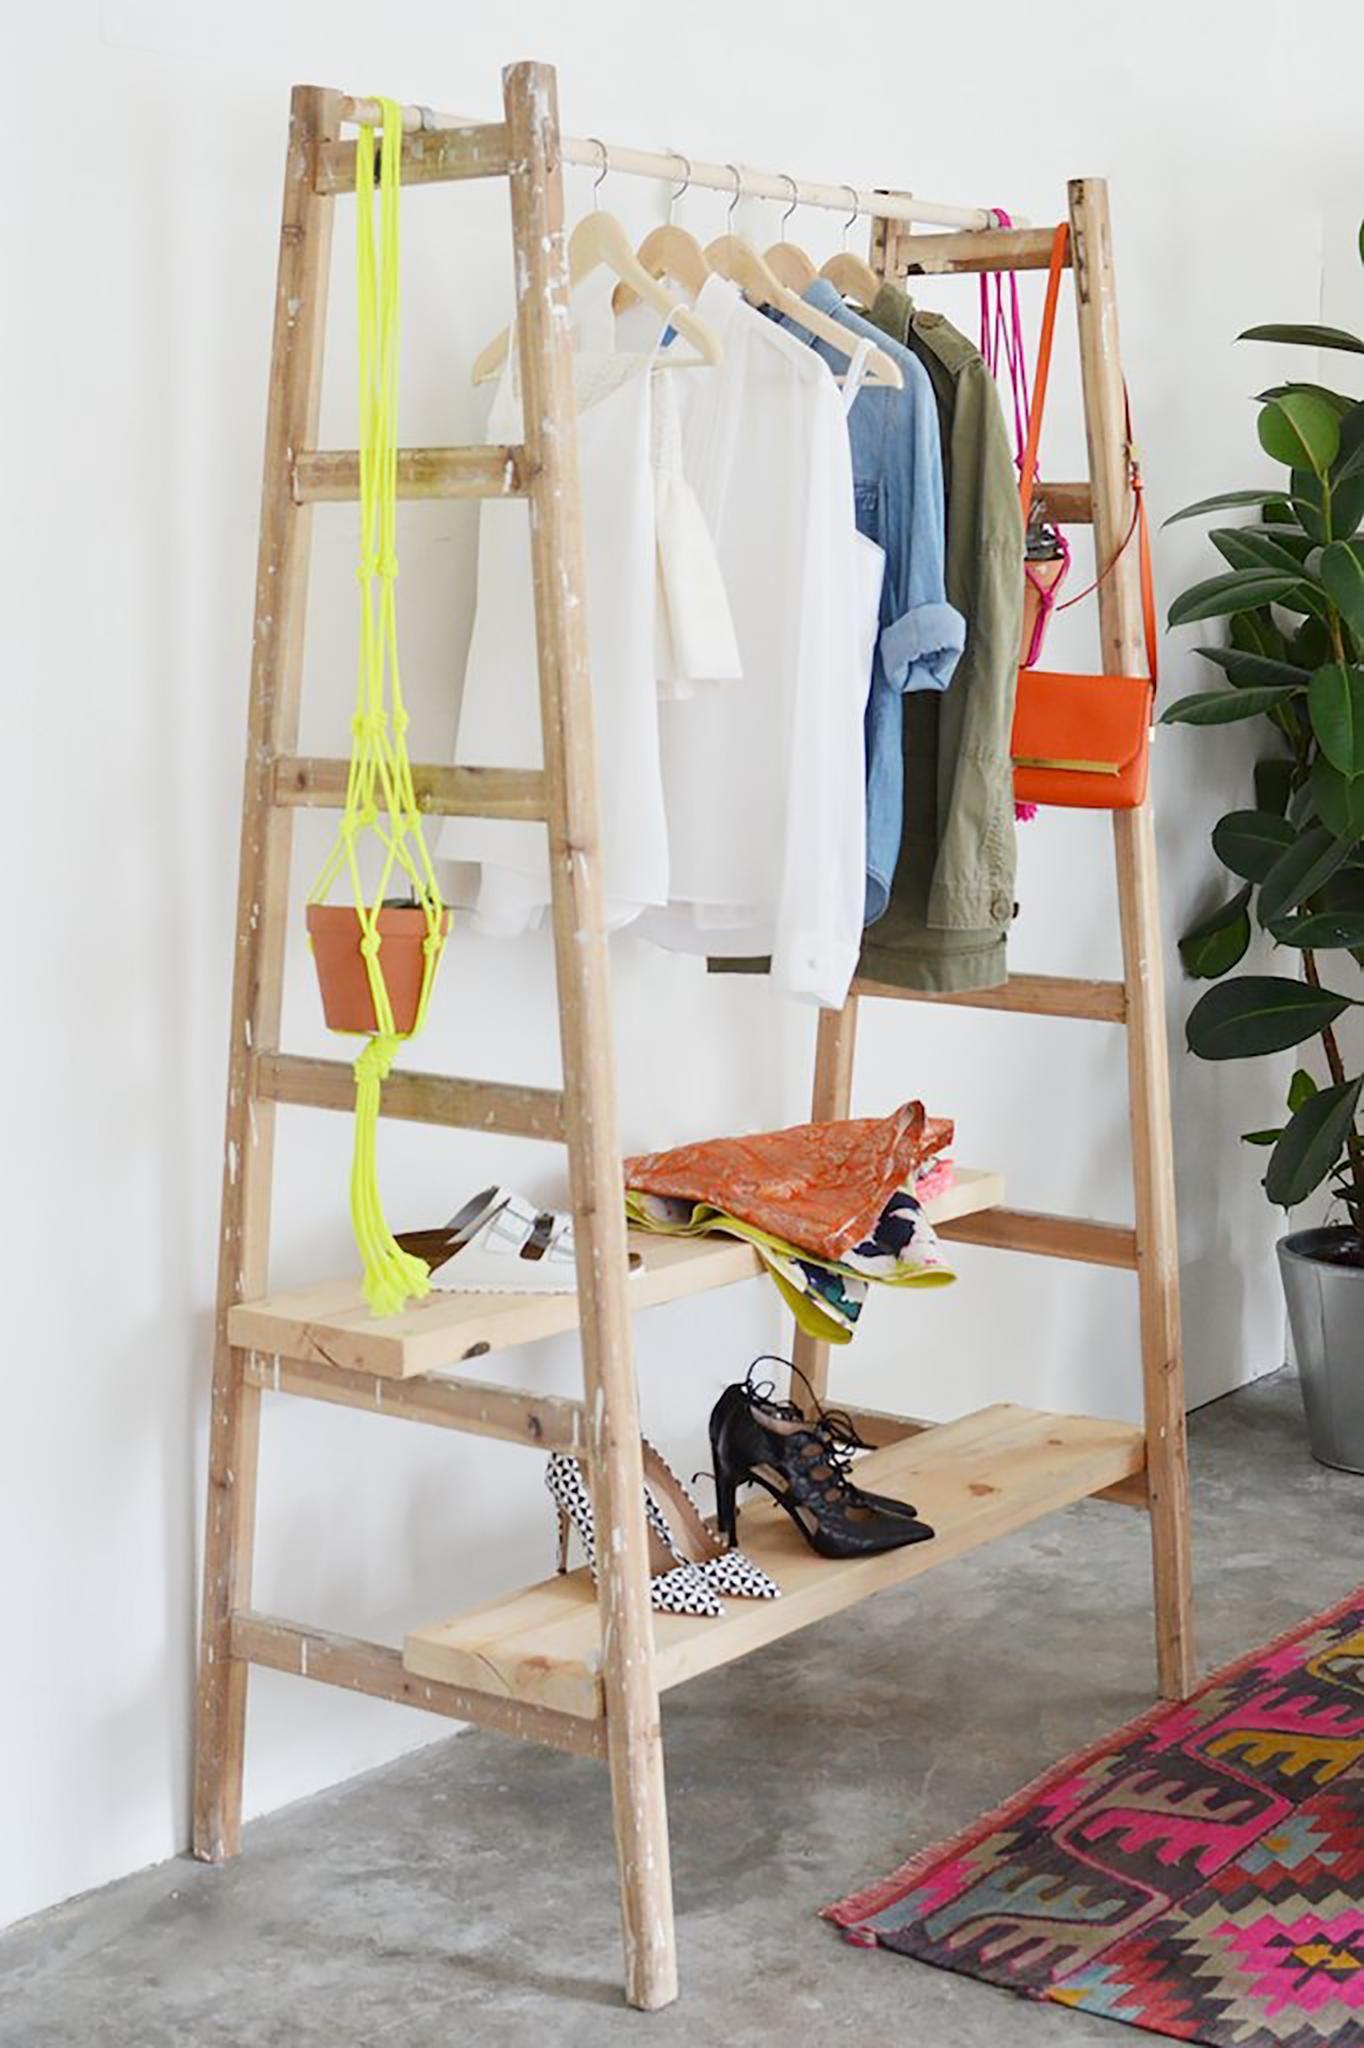 12 no closet clothes storage ideas storage diy ladder - Clothing storage ideas no closet ...